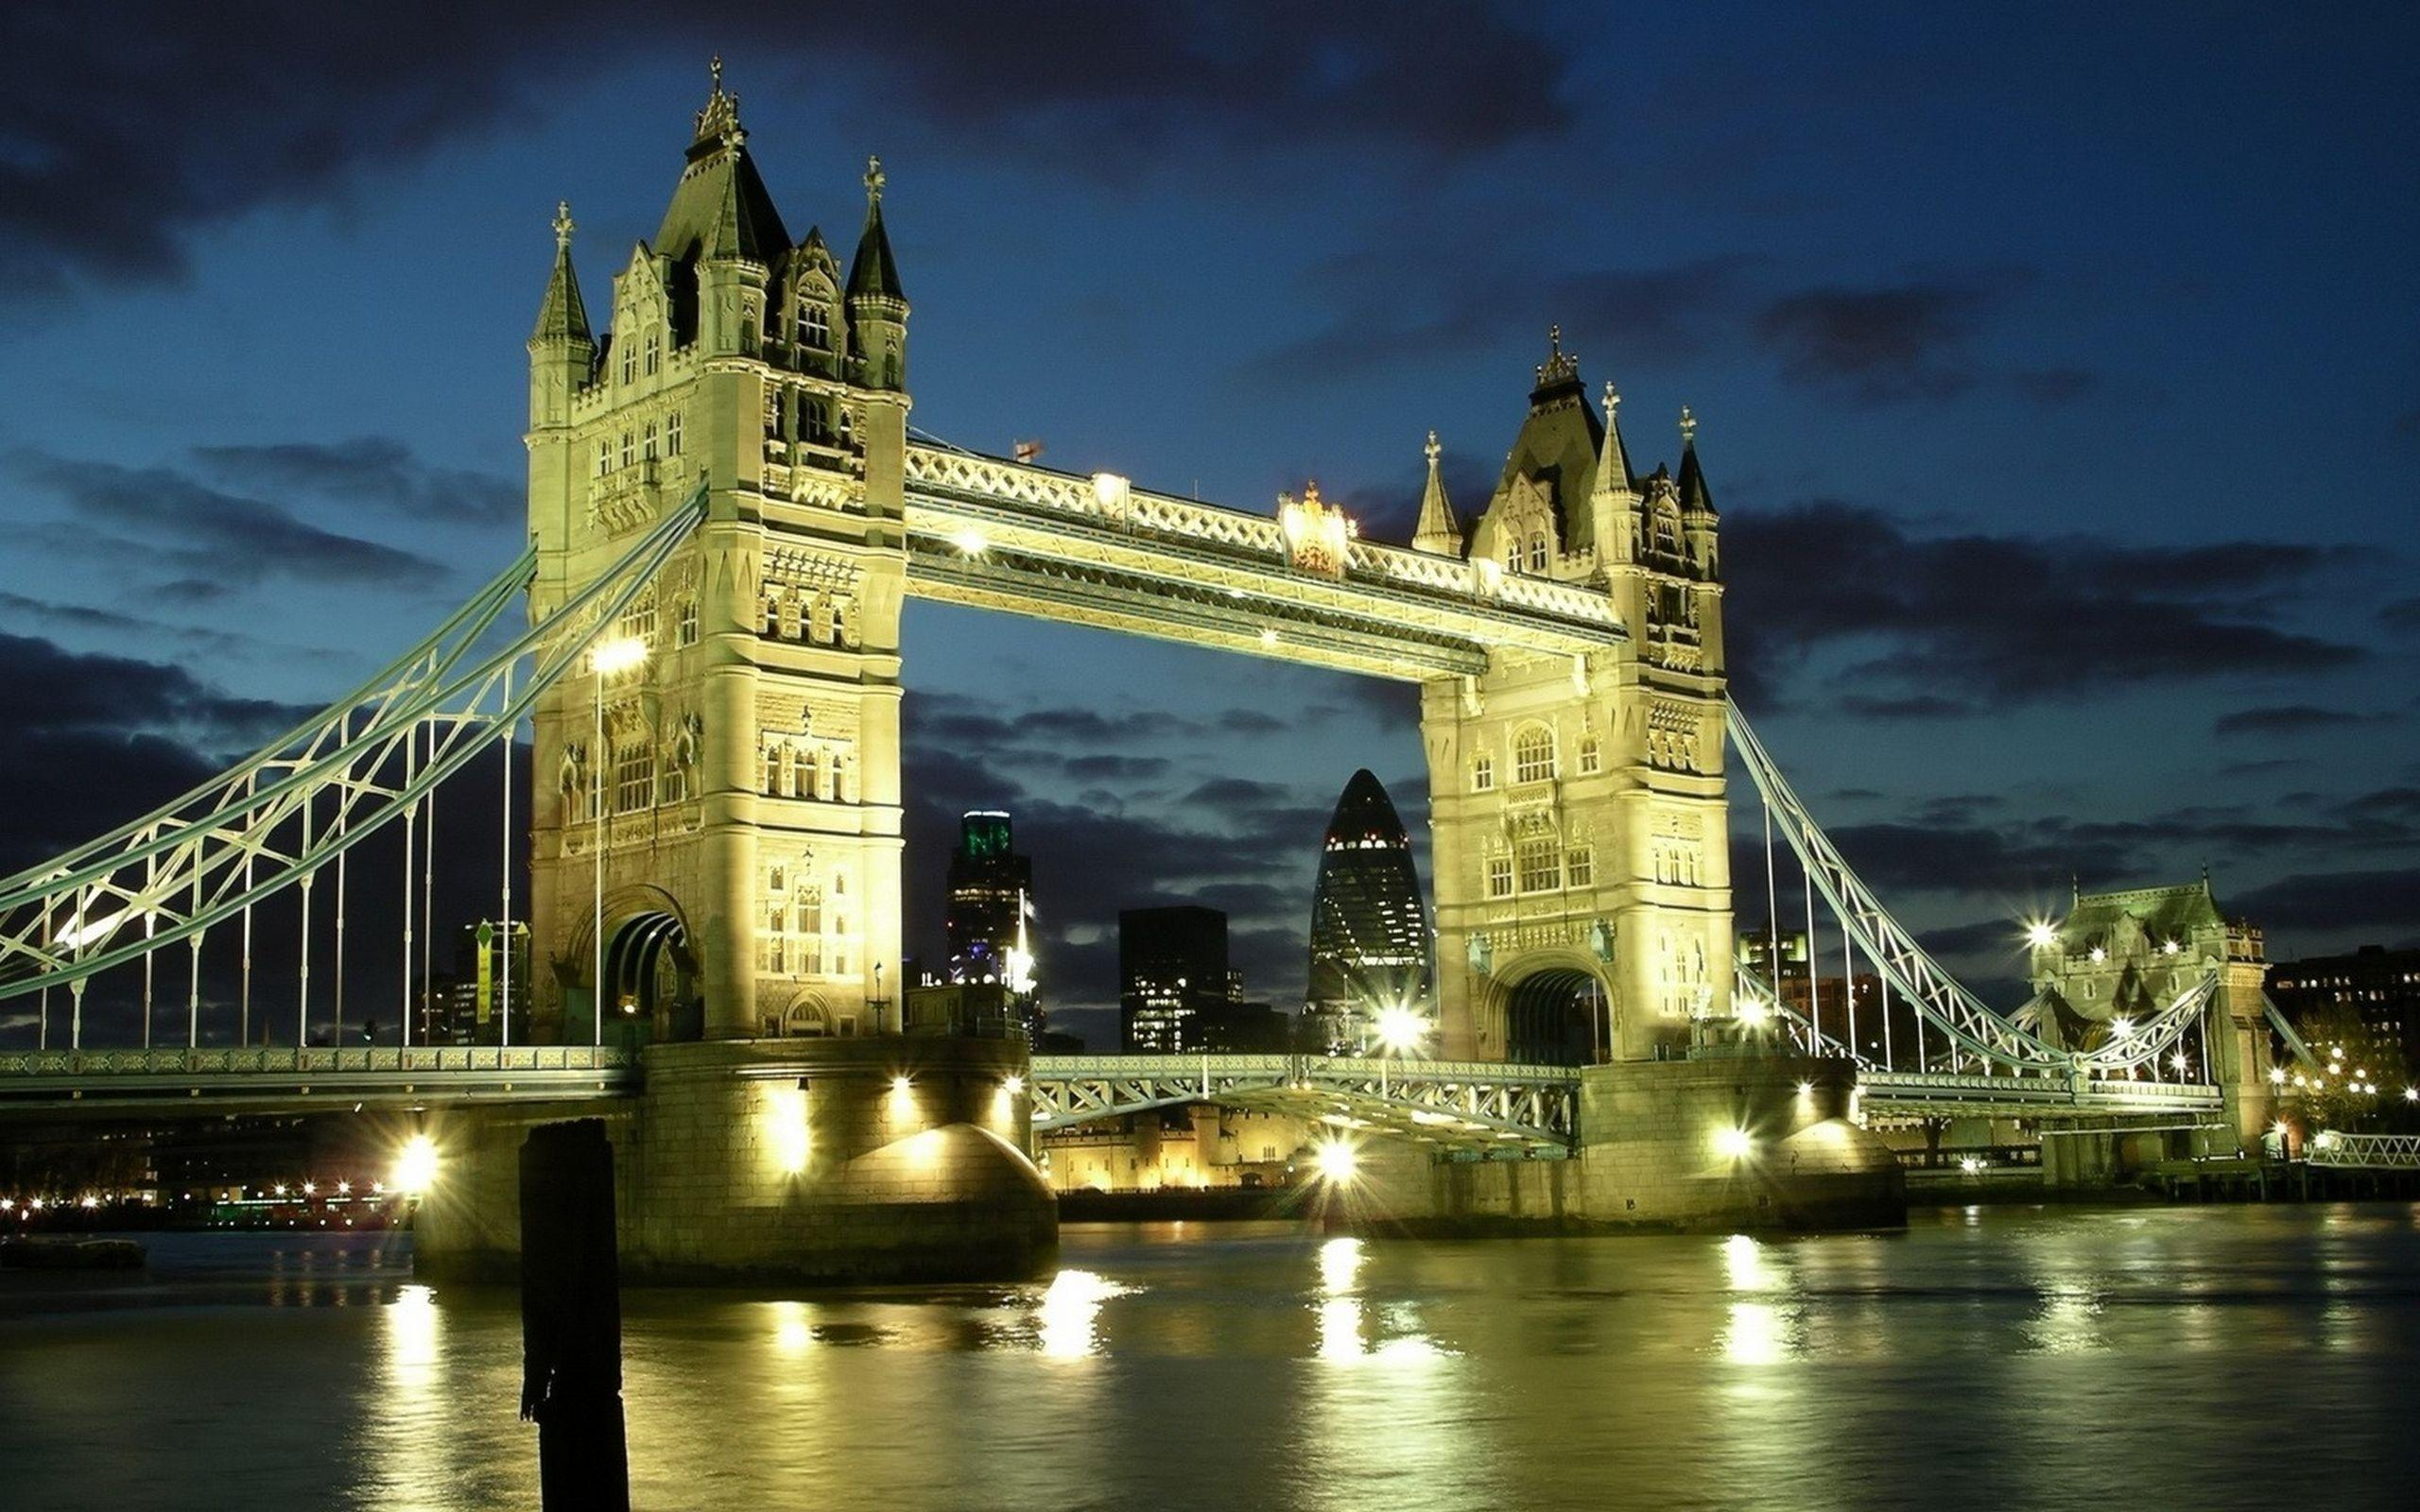 wallpaper bridge london scenic - photo #19